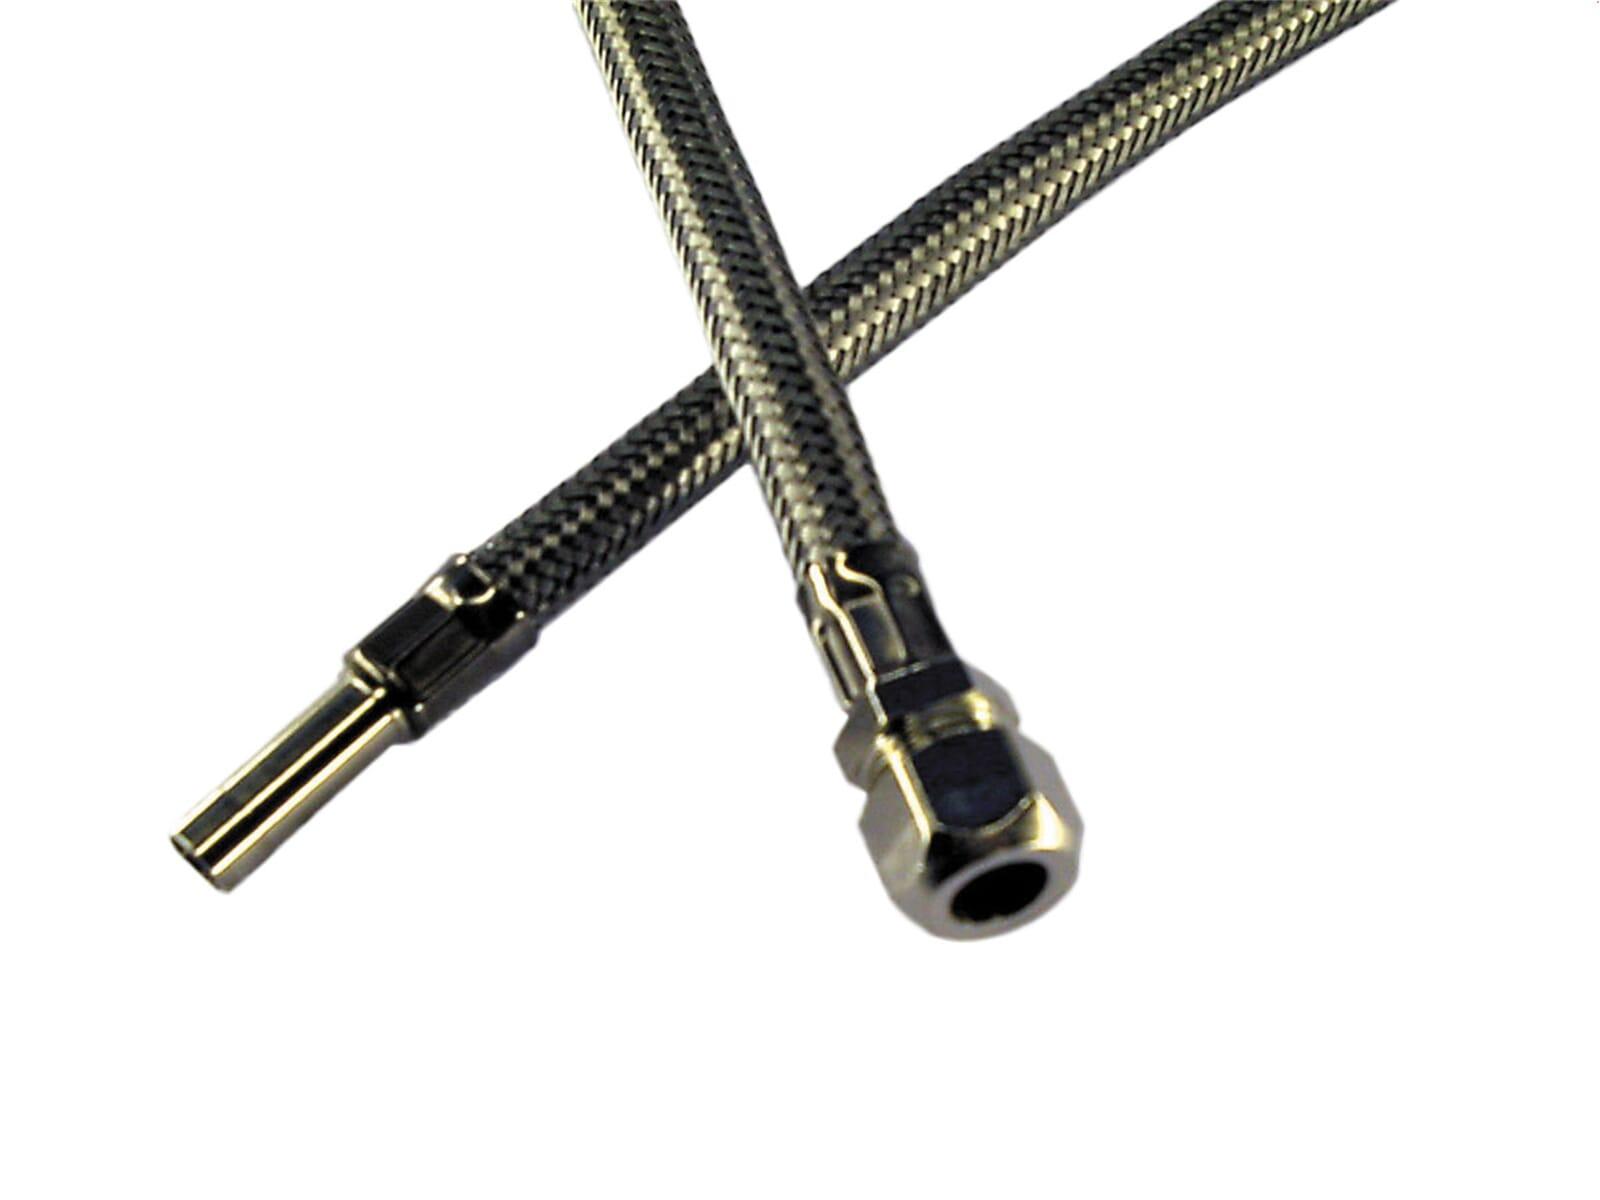 Puteus 52751 Flexibler Schlauch 30cm